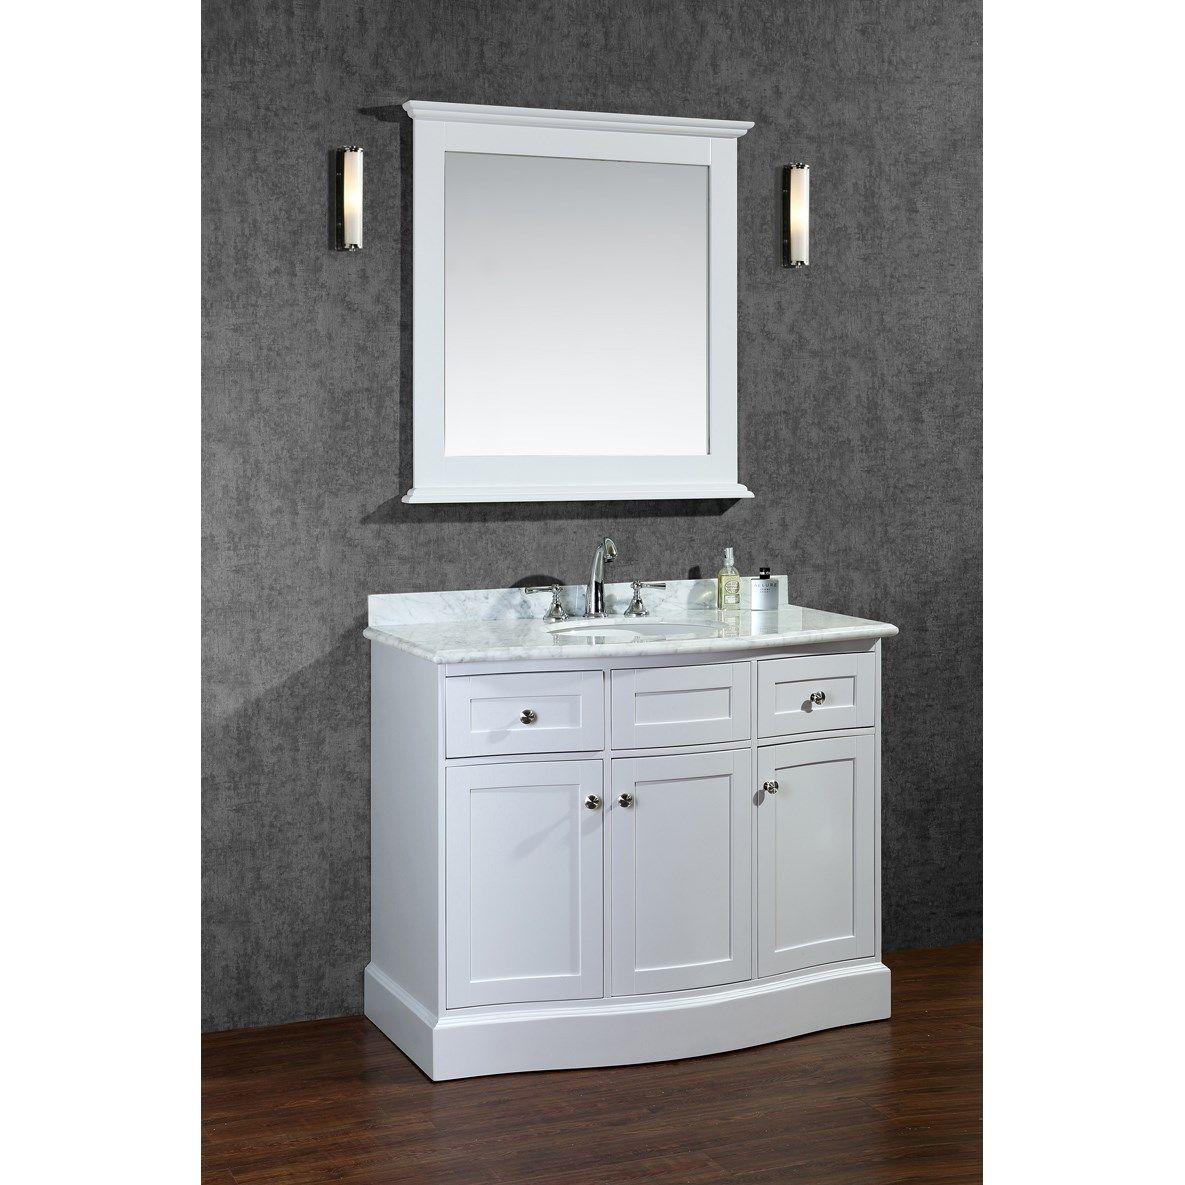 Ariel Bath Scmon42swh Montauk 42 Single Sink Bathroom Vanity Set With Mirror In Alpine White V Single Sink Vanity White Vanity Bathroom Bathroom Sink Vanity